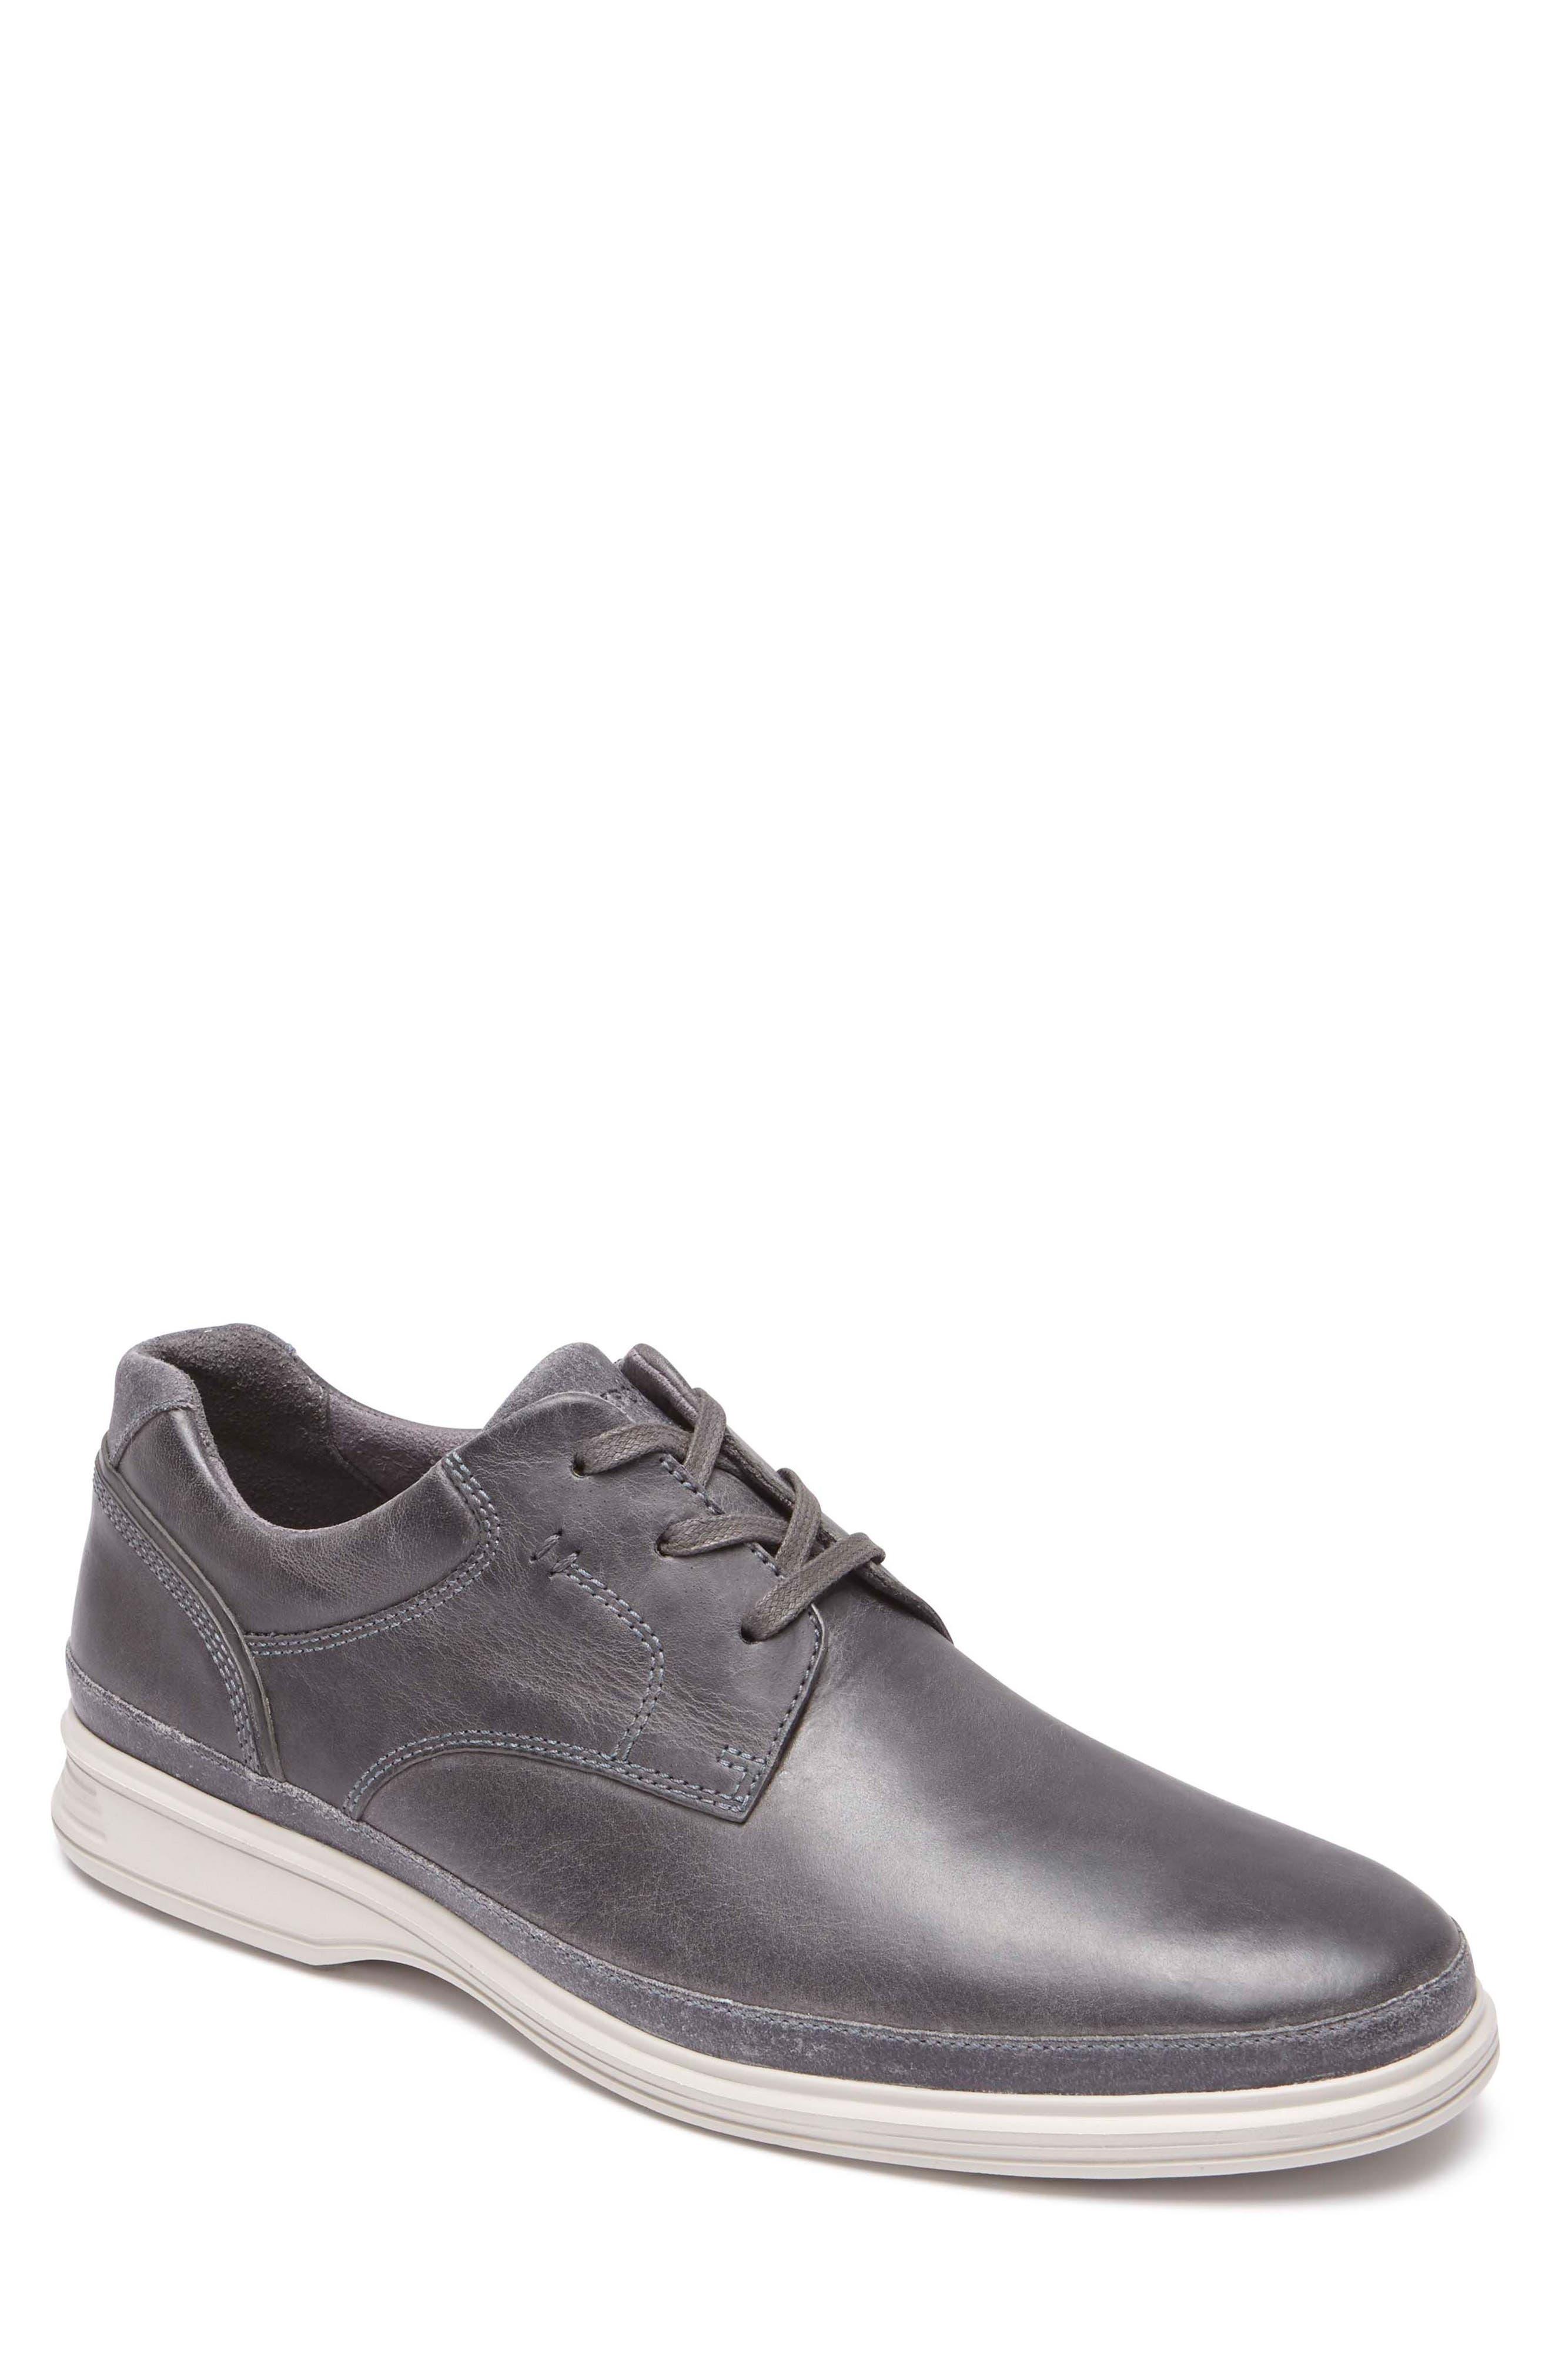 Dressports 2 Go Plain Toe Derby,                             Main thumbnail 1, color,                             Grey Leather